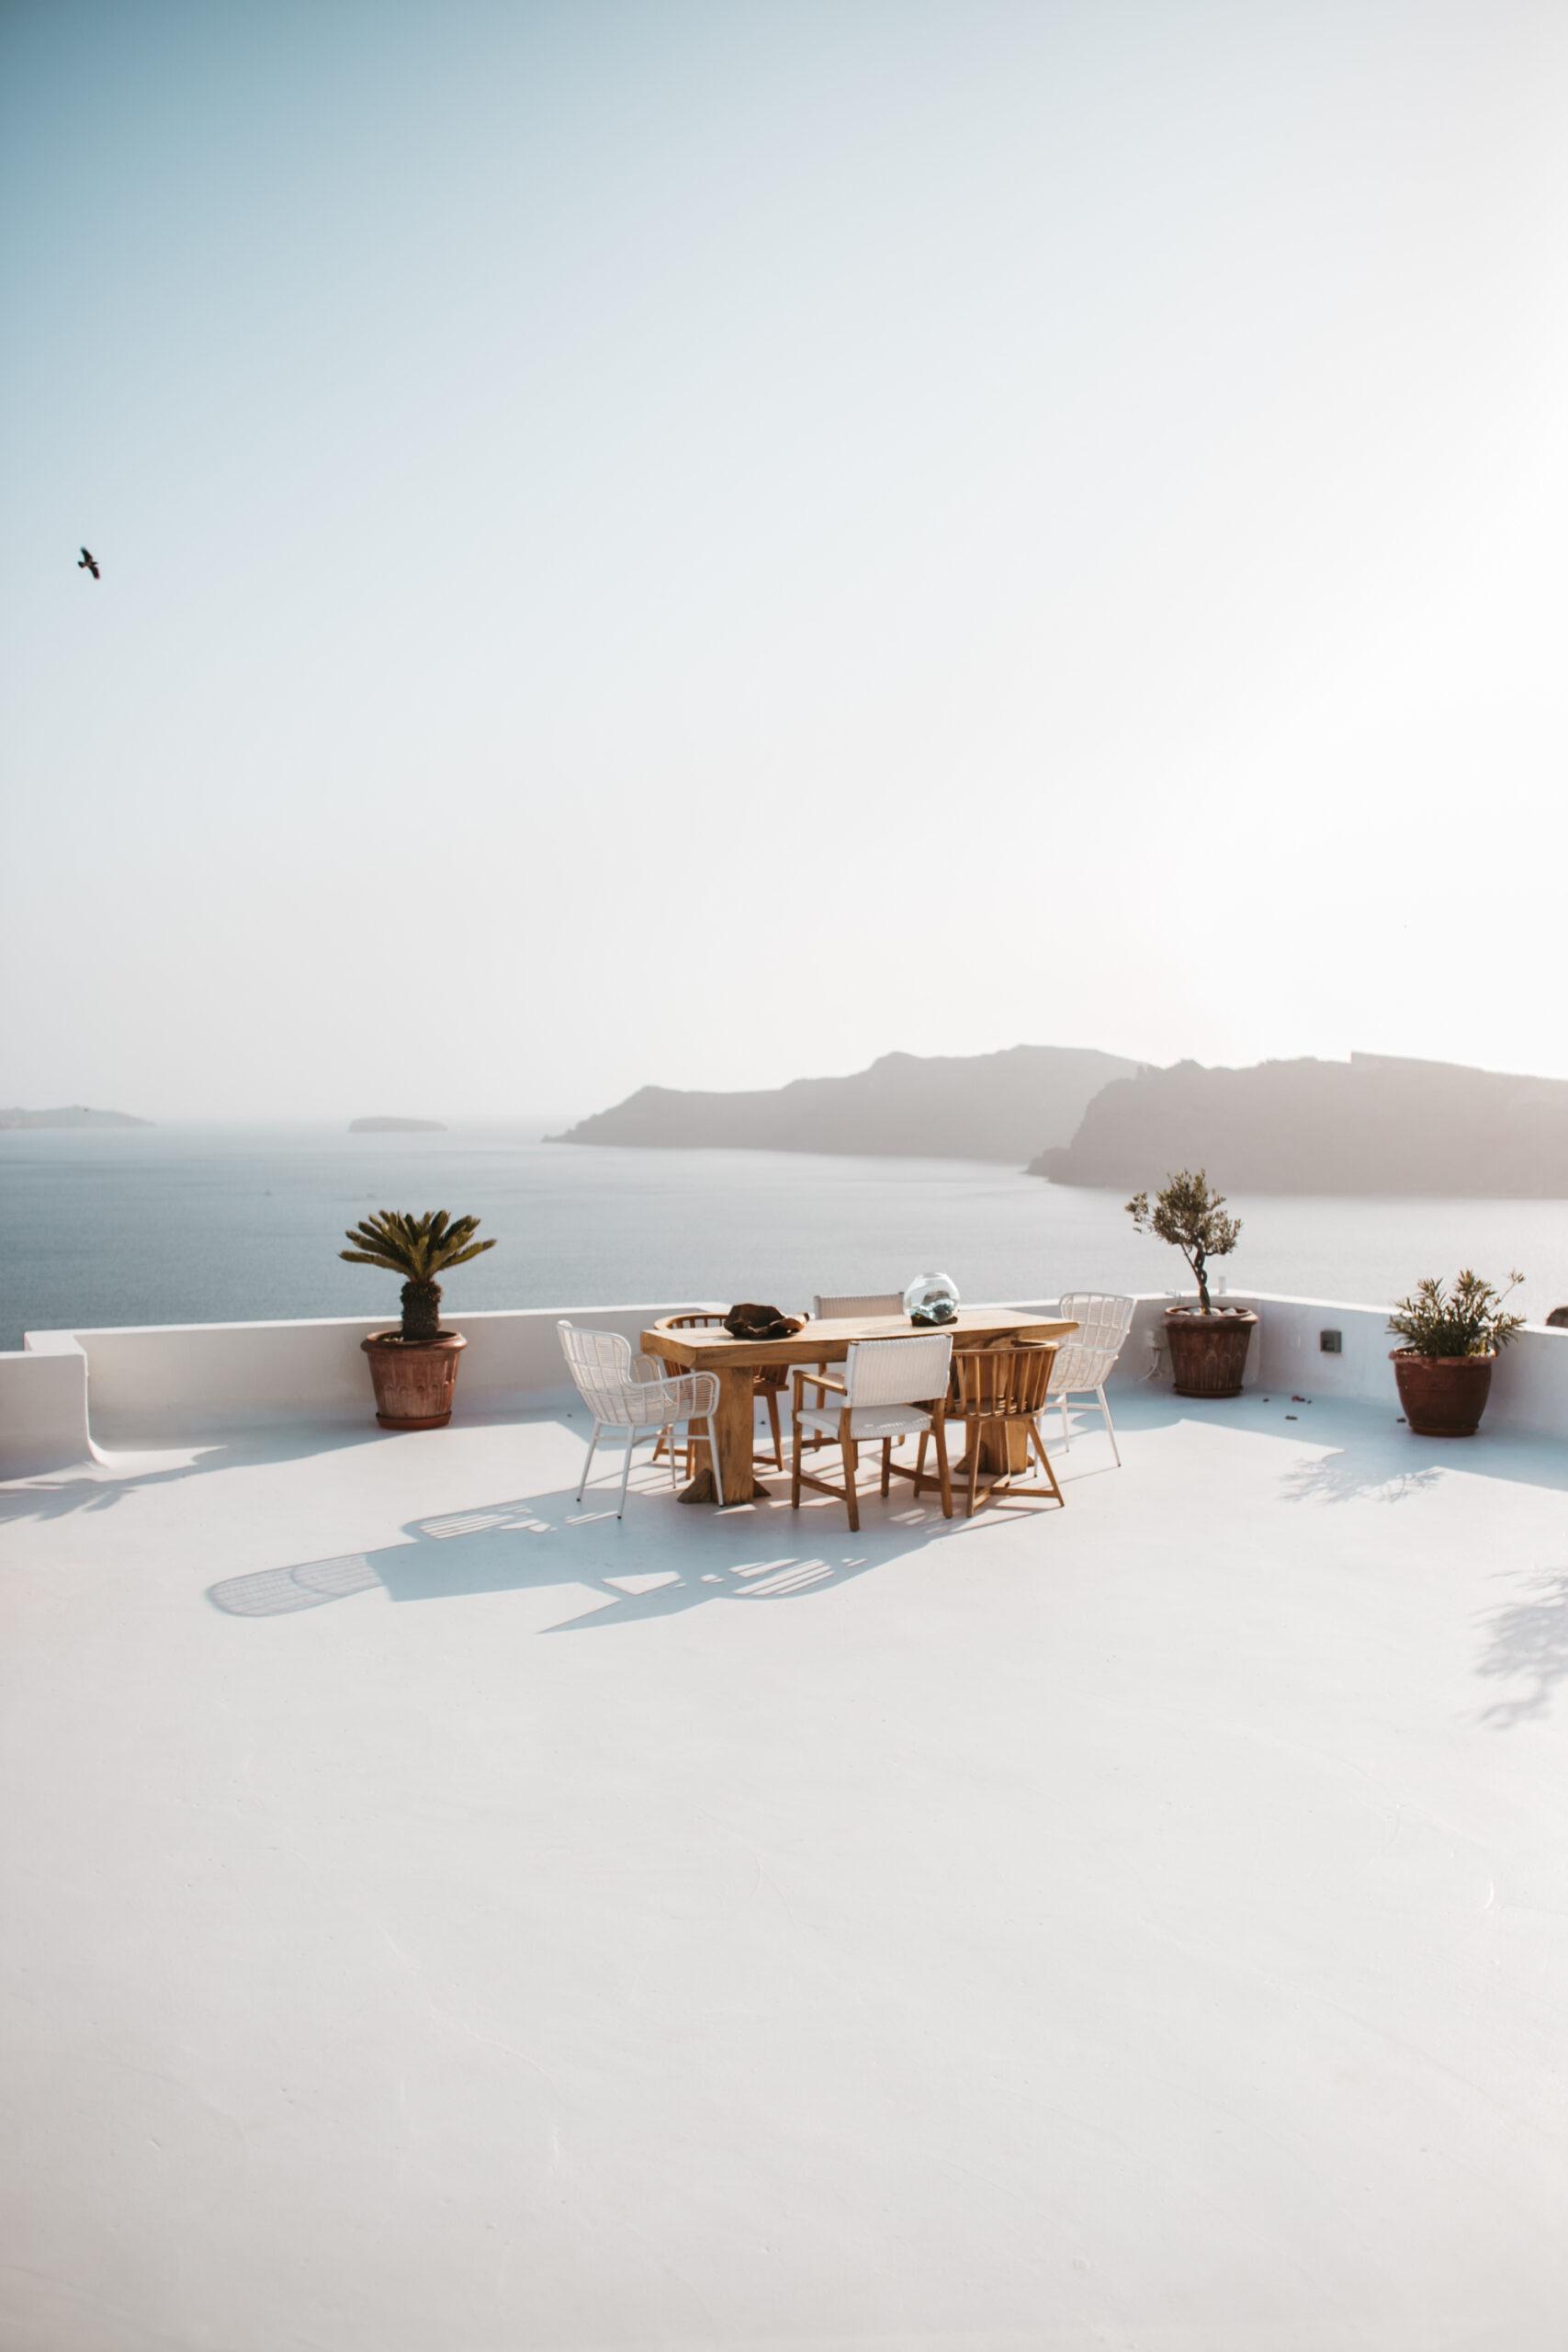 Oia Santorini hotel kaldera caldera, dizajnerski hotel, aranżacja, biały dom